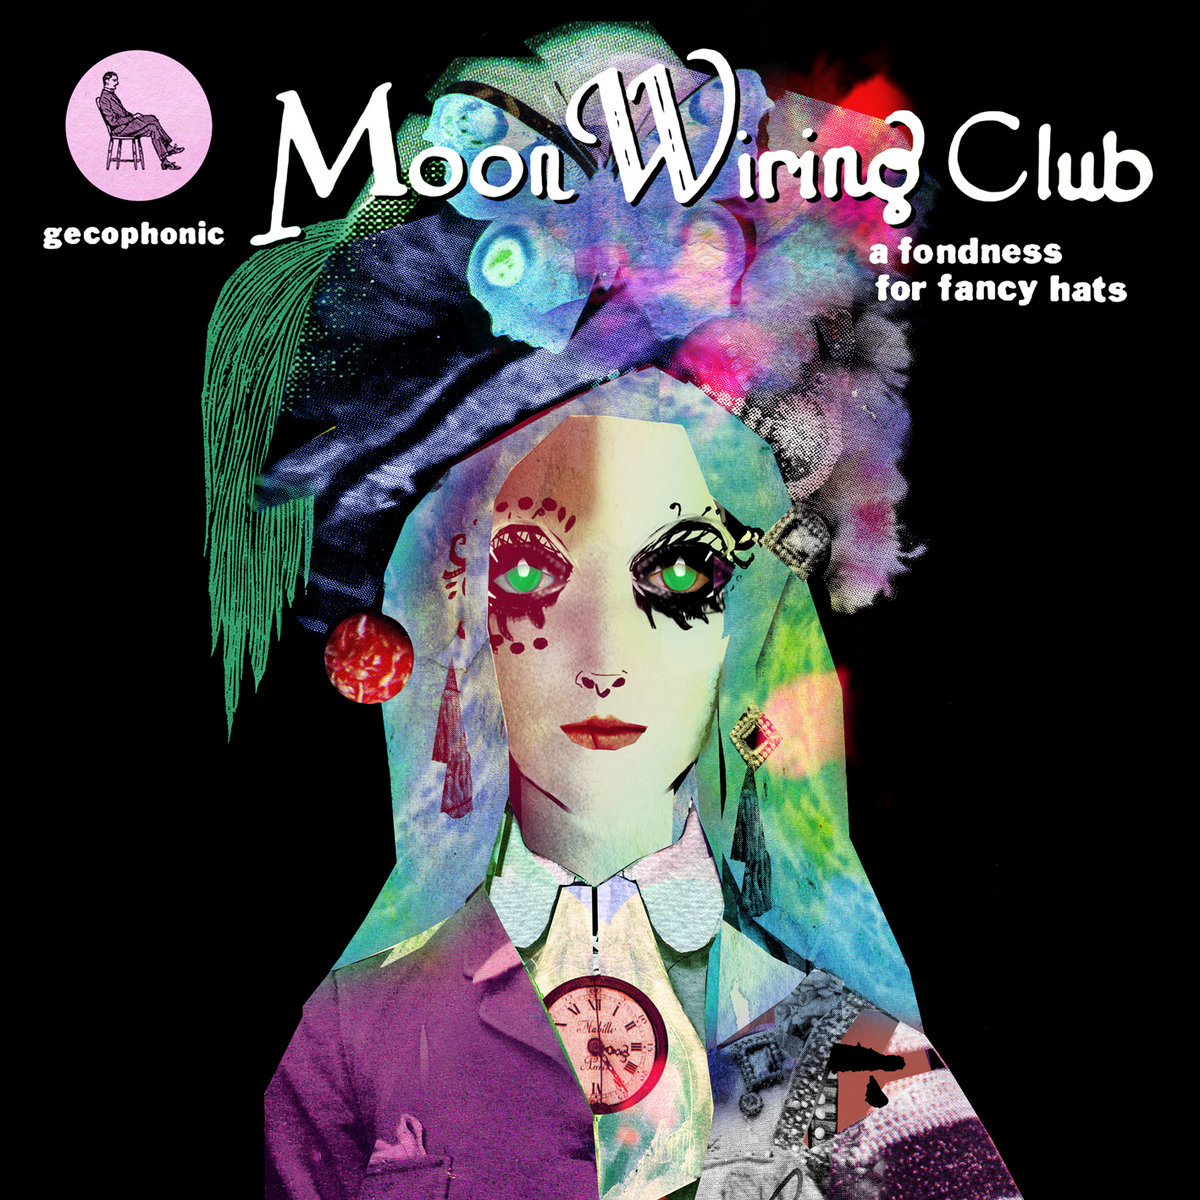 a fondness for fancy hats moon wiring club rh moonwiringclub bandcamp com moon wiring club twitter moon wiring club cateared chocolatiers